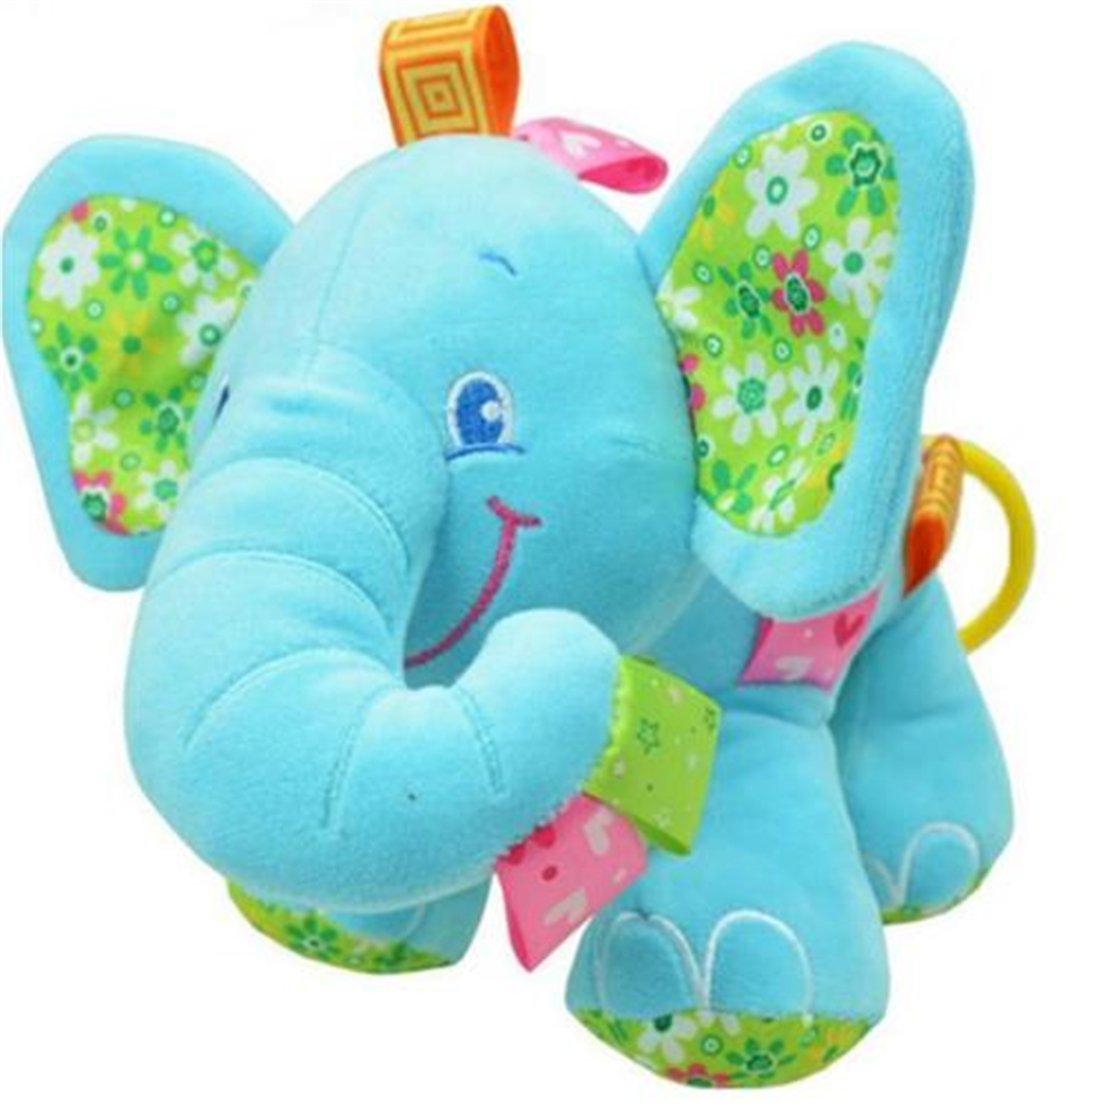 Unke Elephant Stuffed Plushベビーベッドベッド車Hanging Hand RattlesベビーキッズMusical Toy As description グリーン UNIQUE XXX  グリーン B074SNRSJX